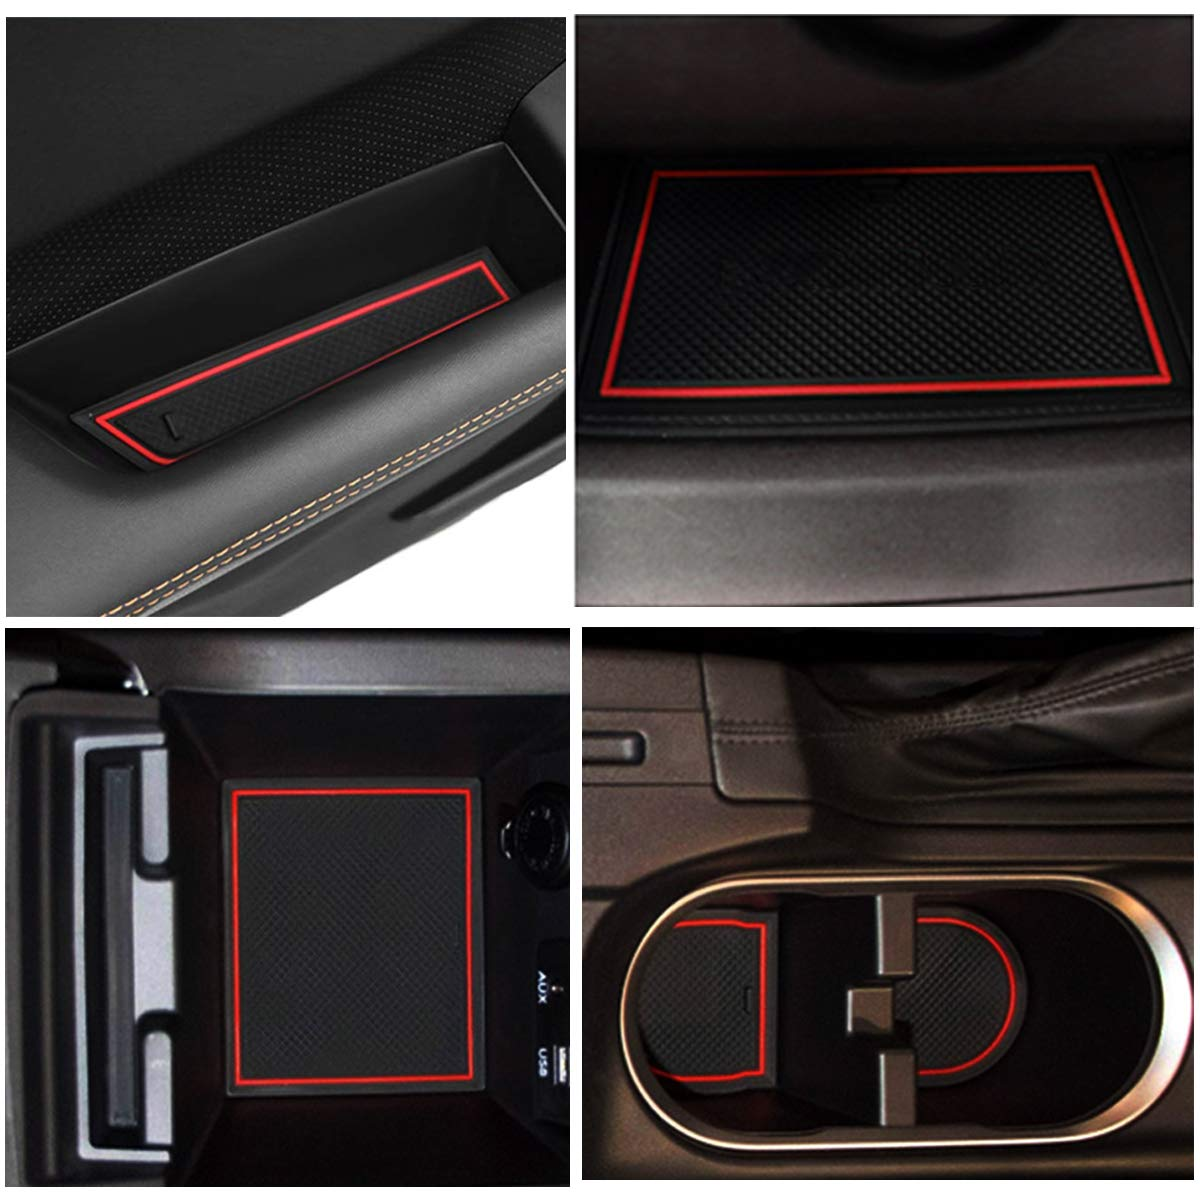 White Jaronx 14PCS Center Console Cup Holder Liner for Subaru Impreza and Crosstrek 2018 2019 2020,Center Console Mats Anti-dust Non-Slip Interior Door Storage Mat Pad